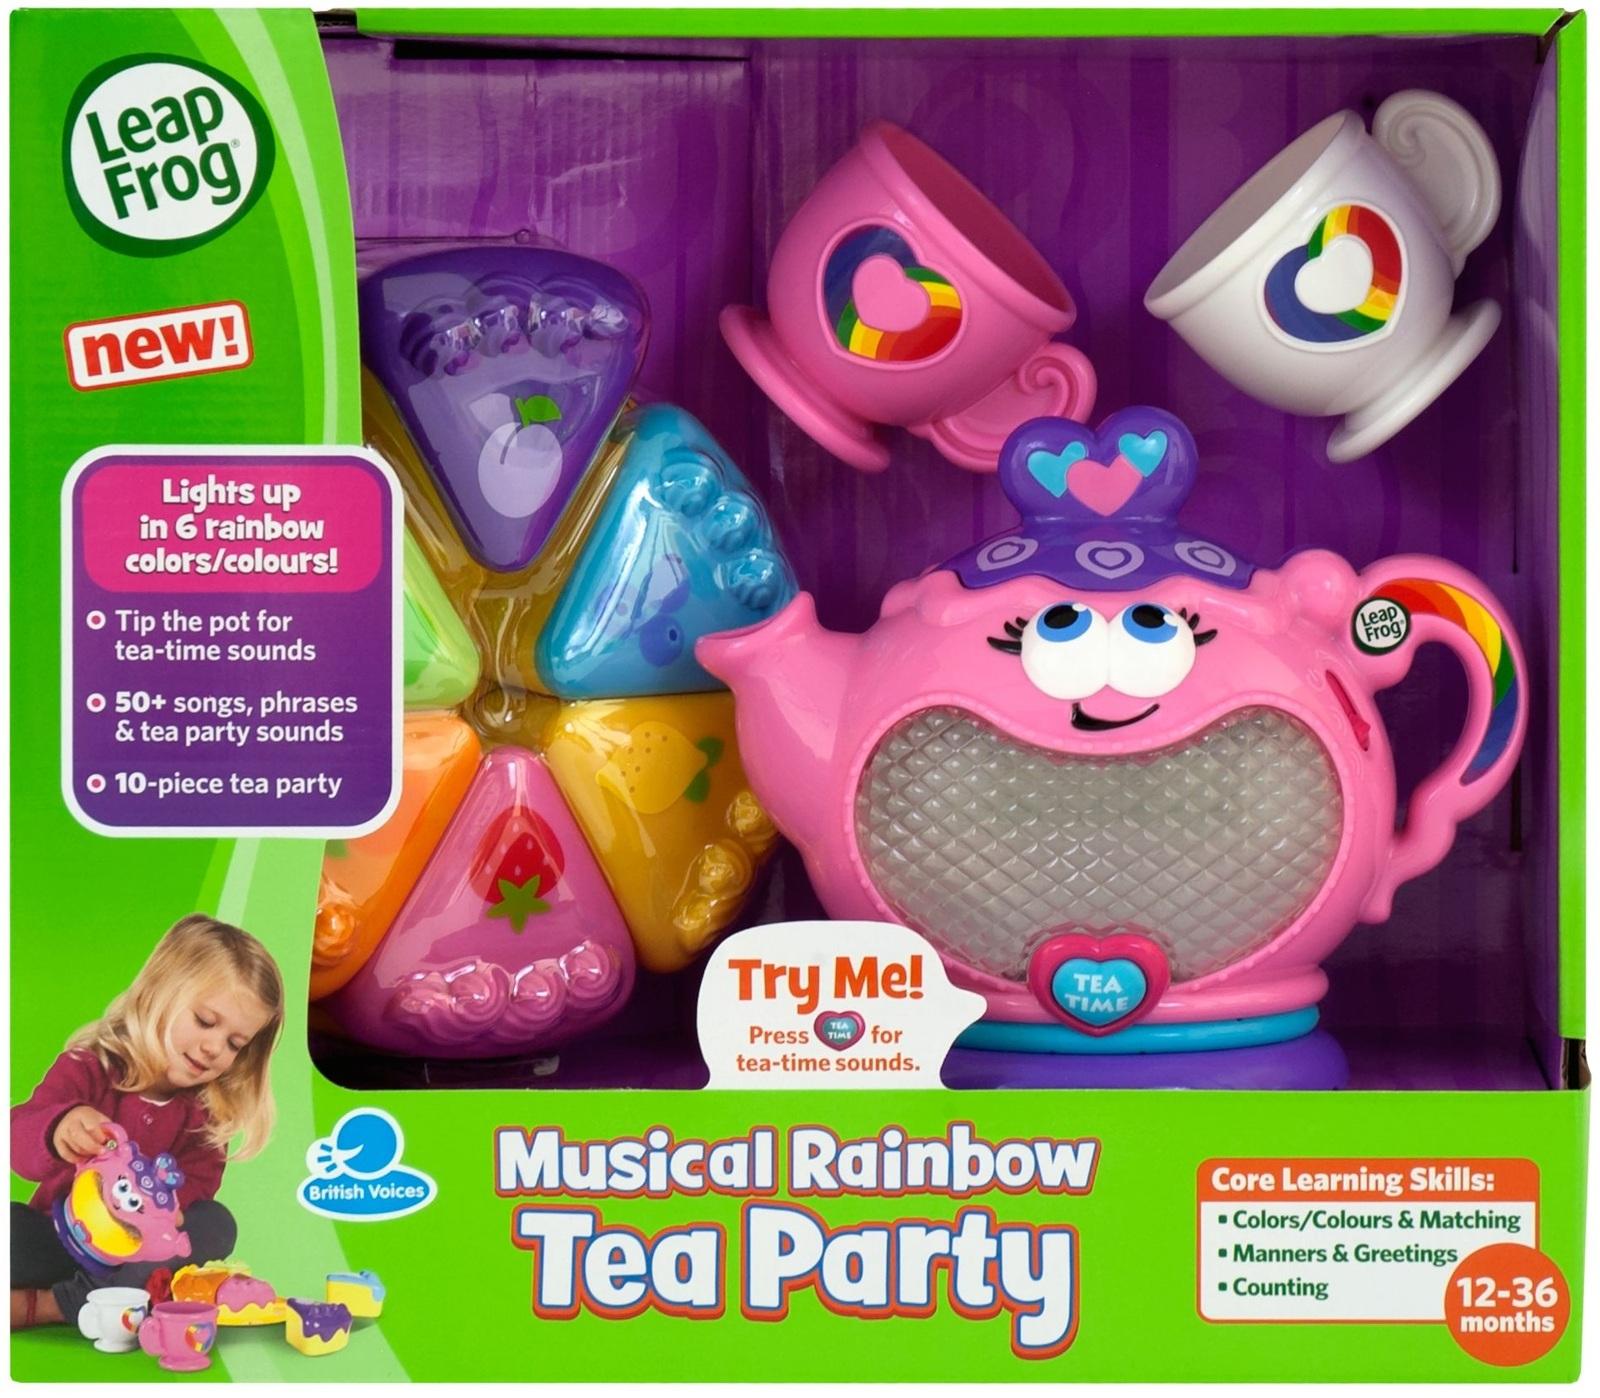 LeapFrog - Musical Rainbow Tea Party image